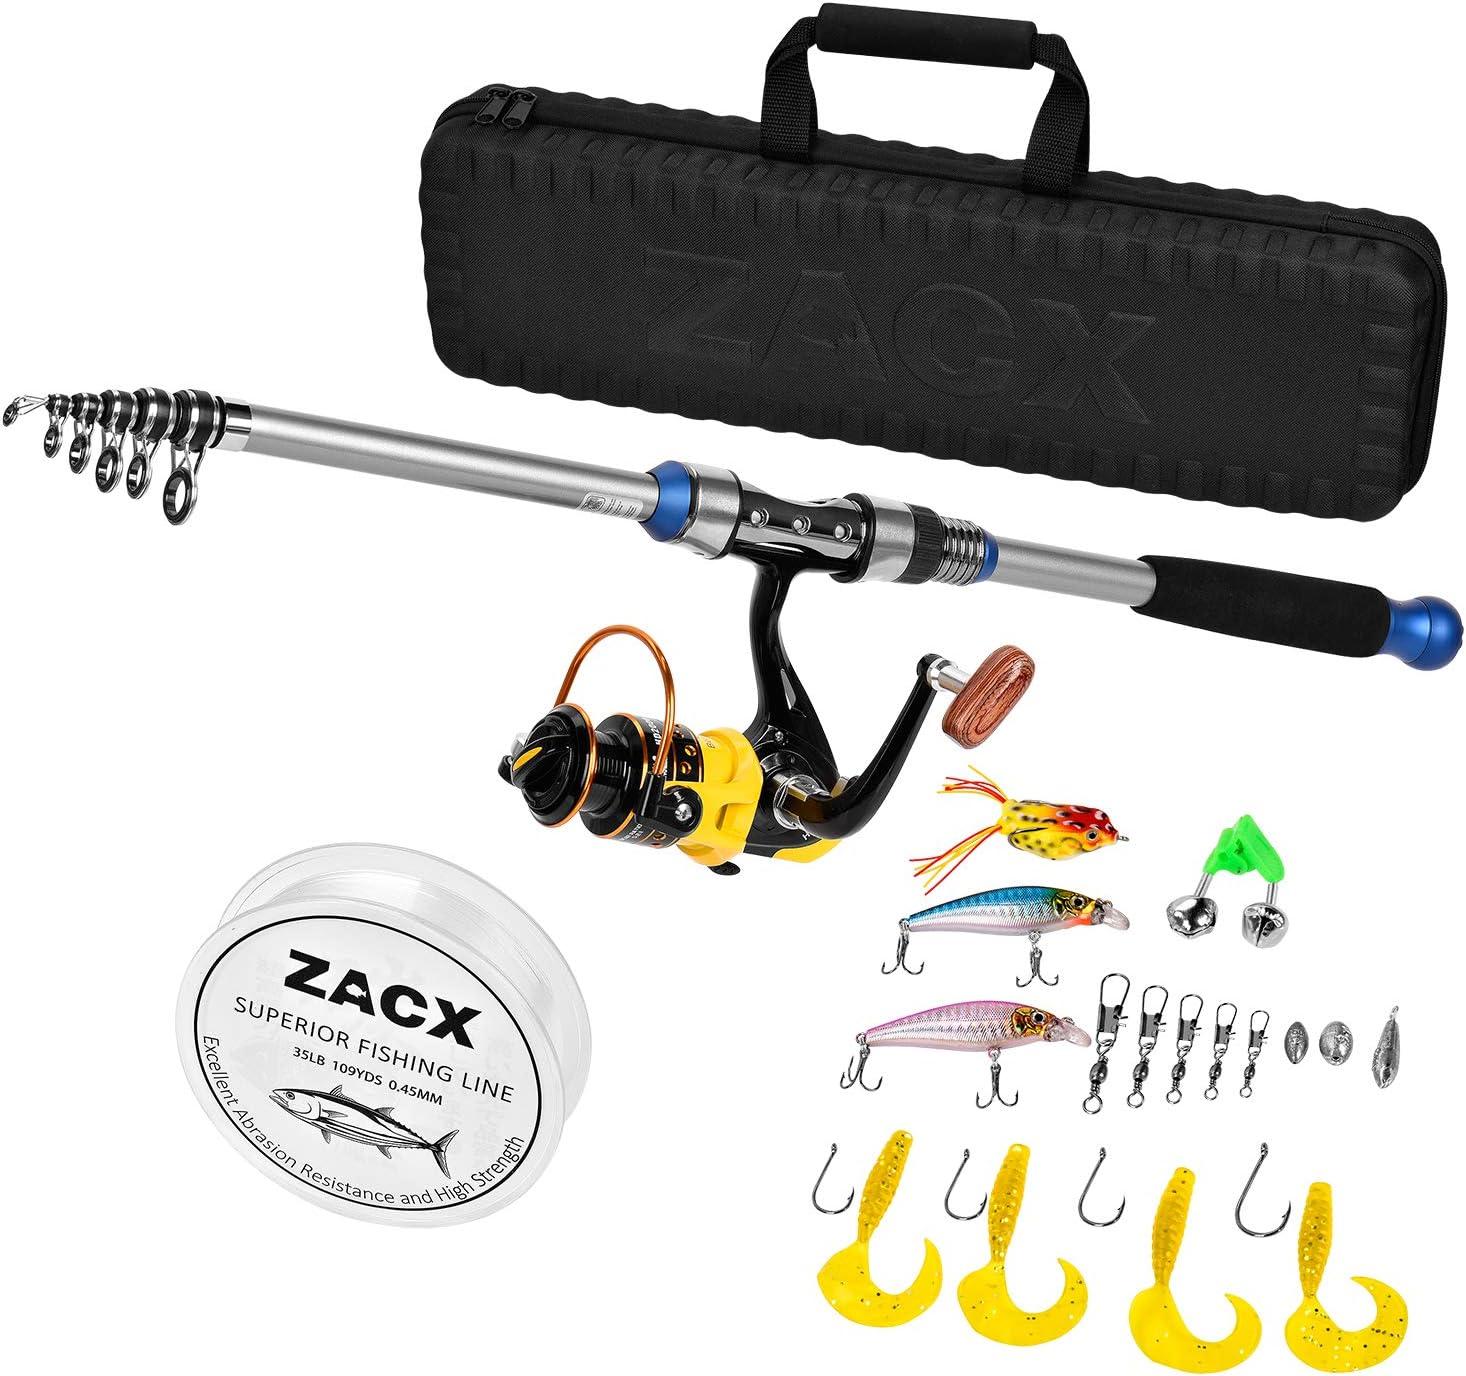 AZHOKTD Juego completo de ca/ña de pescar telesc/ópica port/átil y carrete de pesca con kit completo para pesca en agua salada y agua dulce